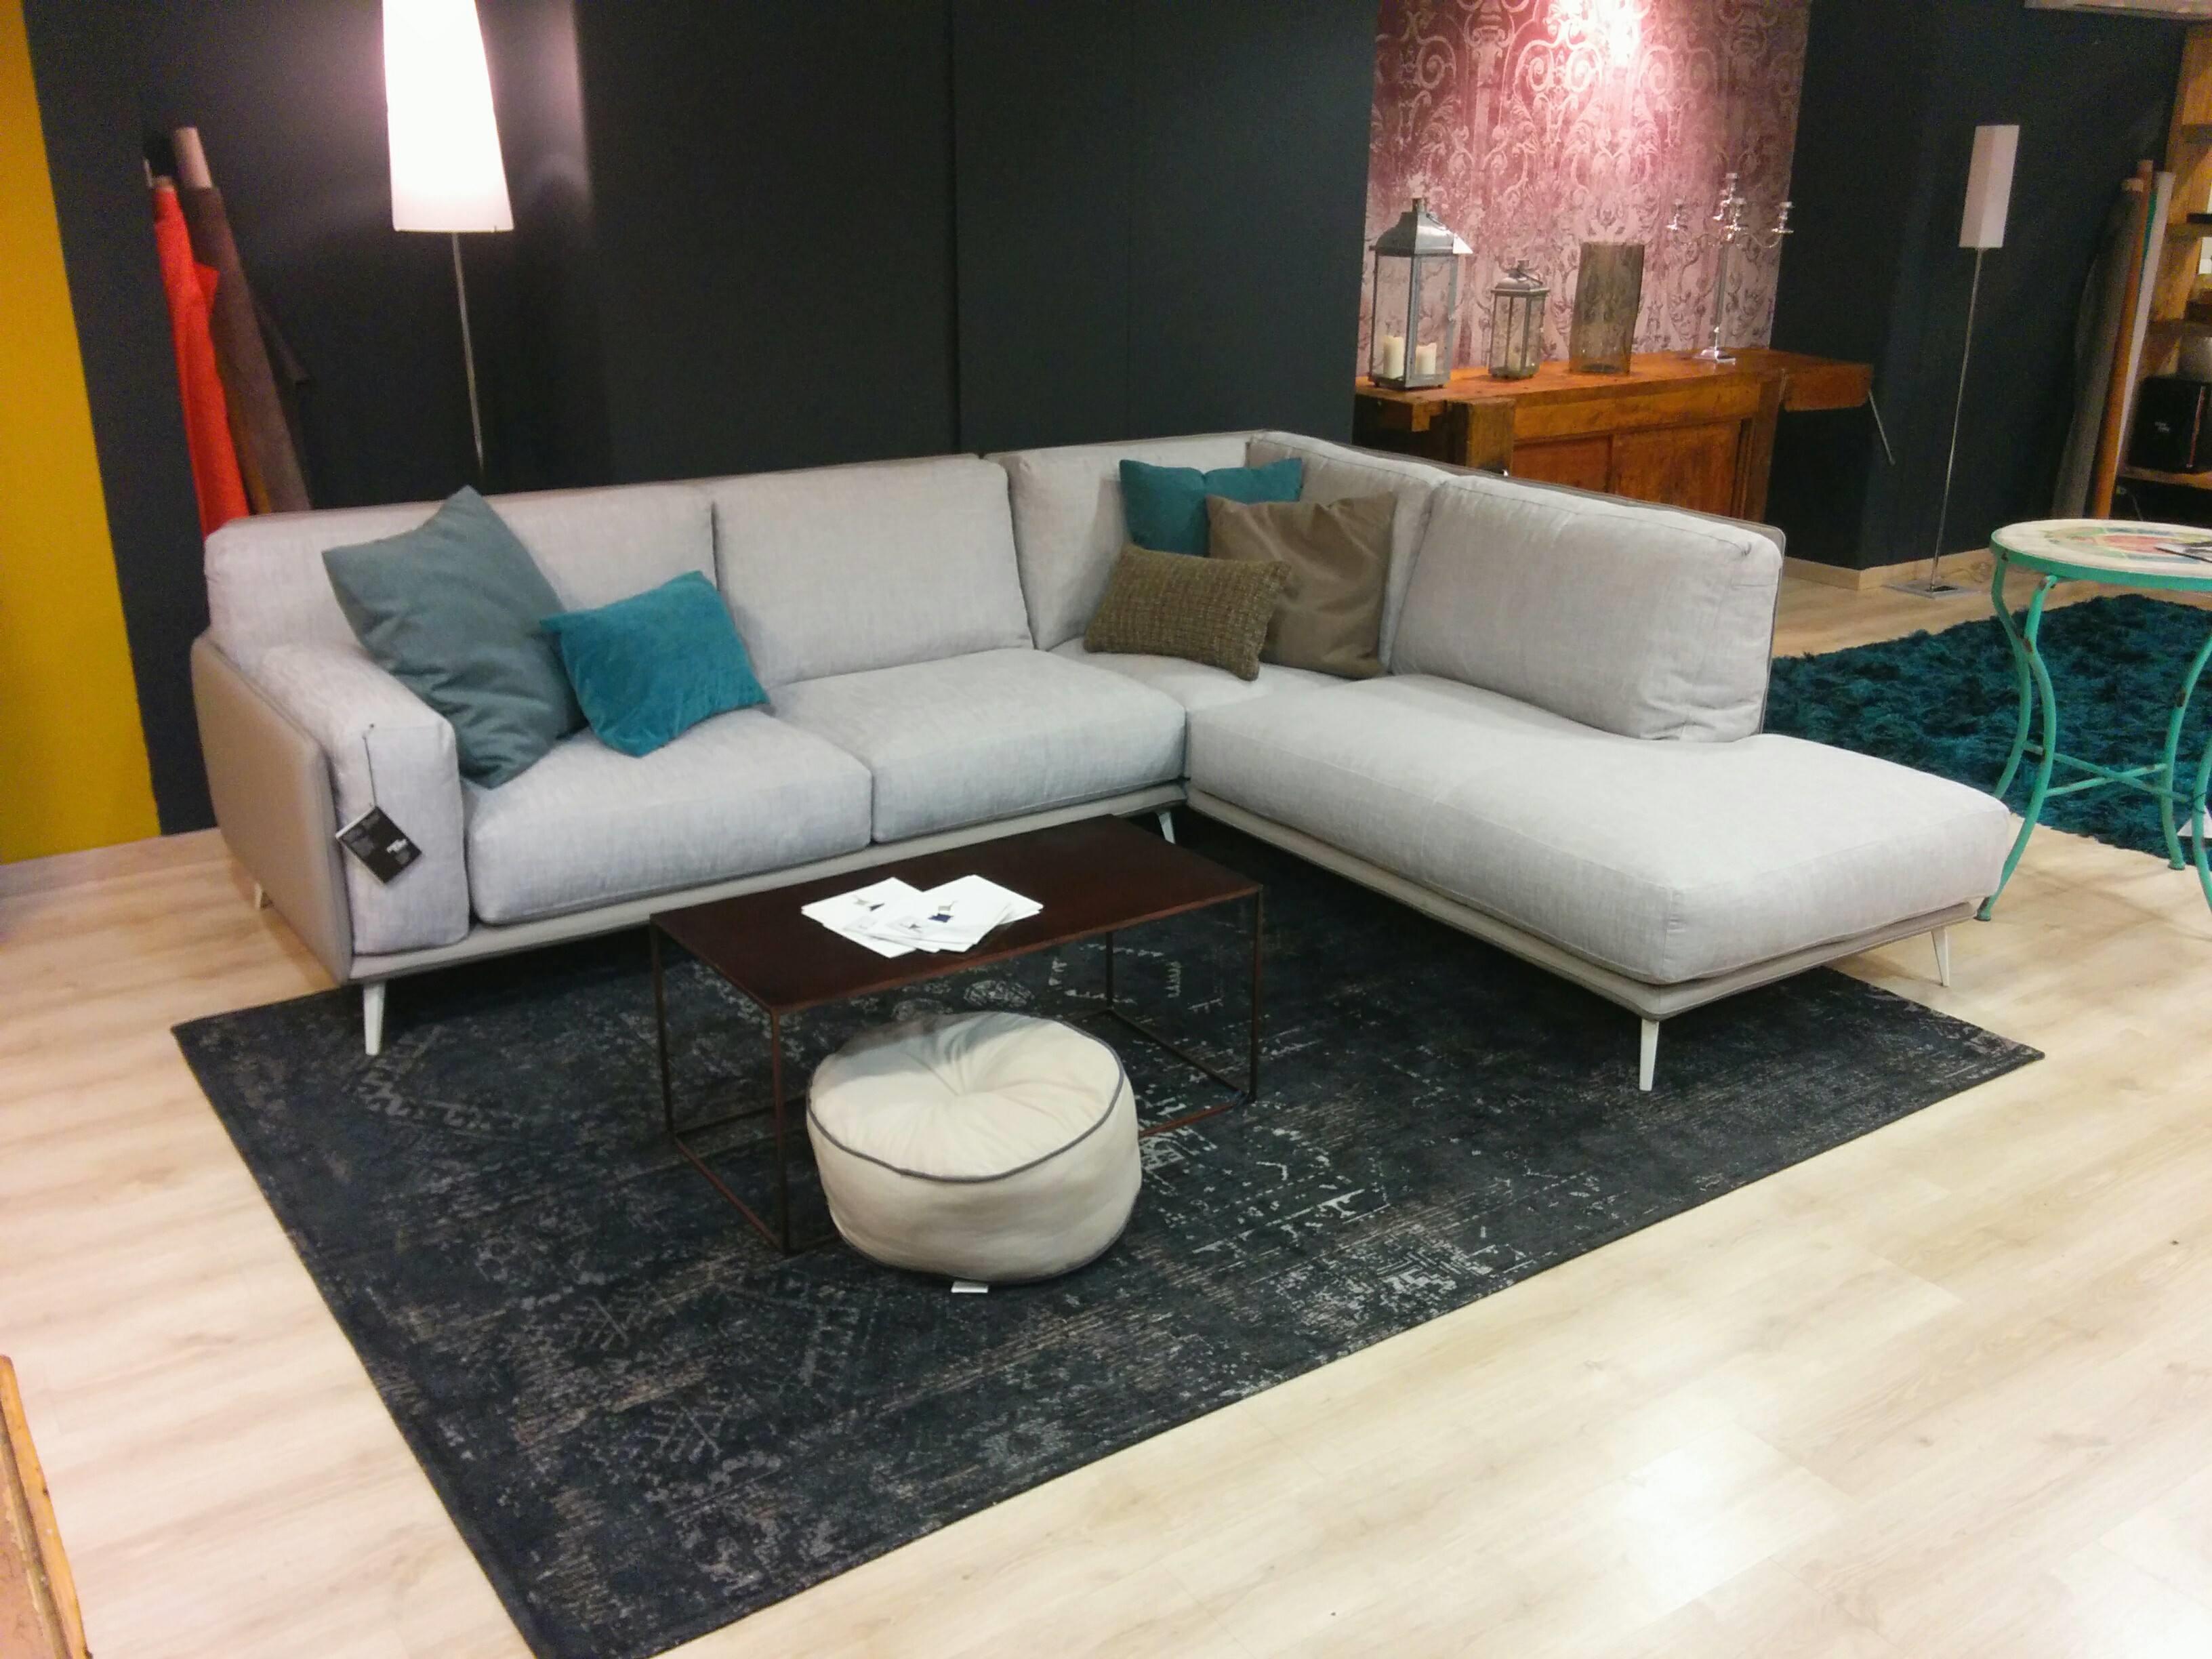 Offerta divano ditre italia kris angolare pelle tessuto - Offerta divano angolare ...